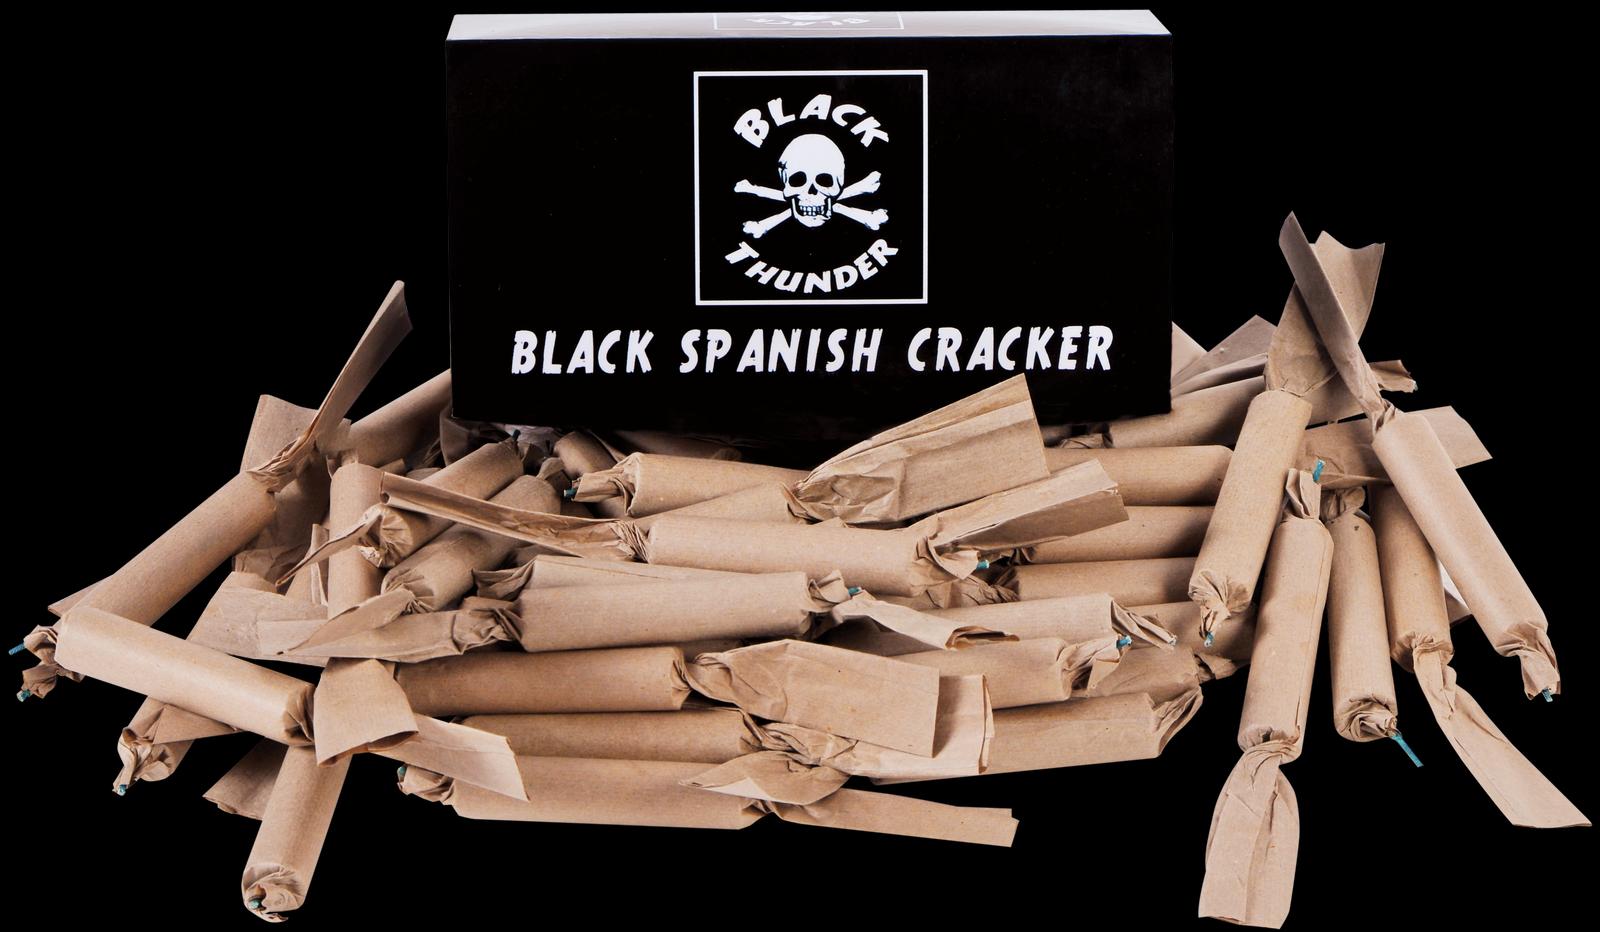 Black Spanish cracker (doos 48 stuks)